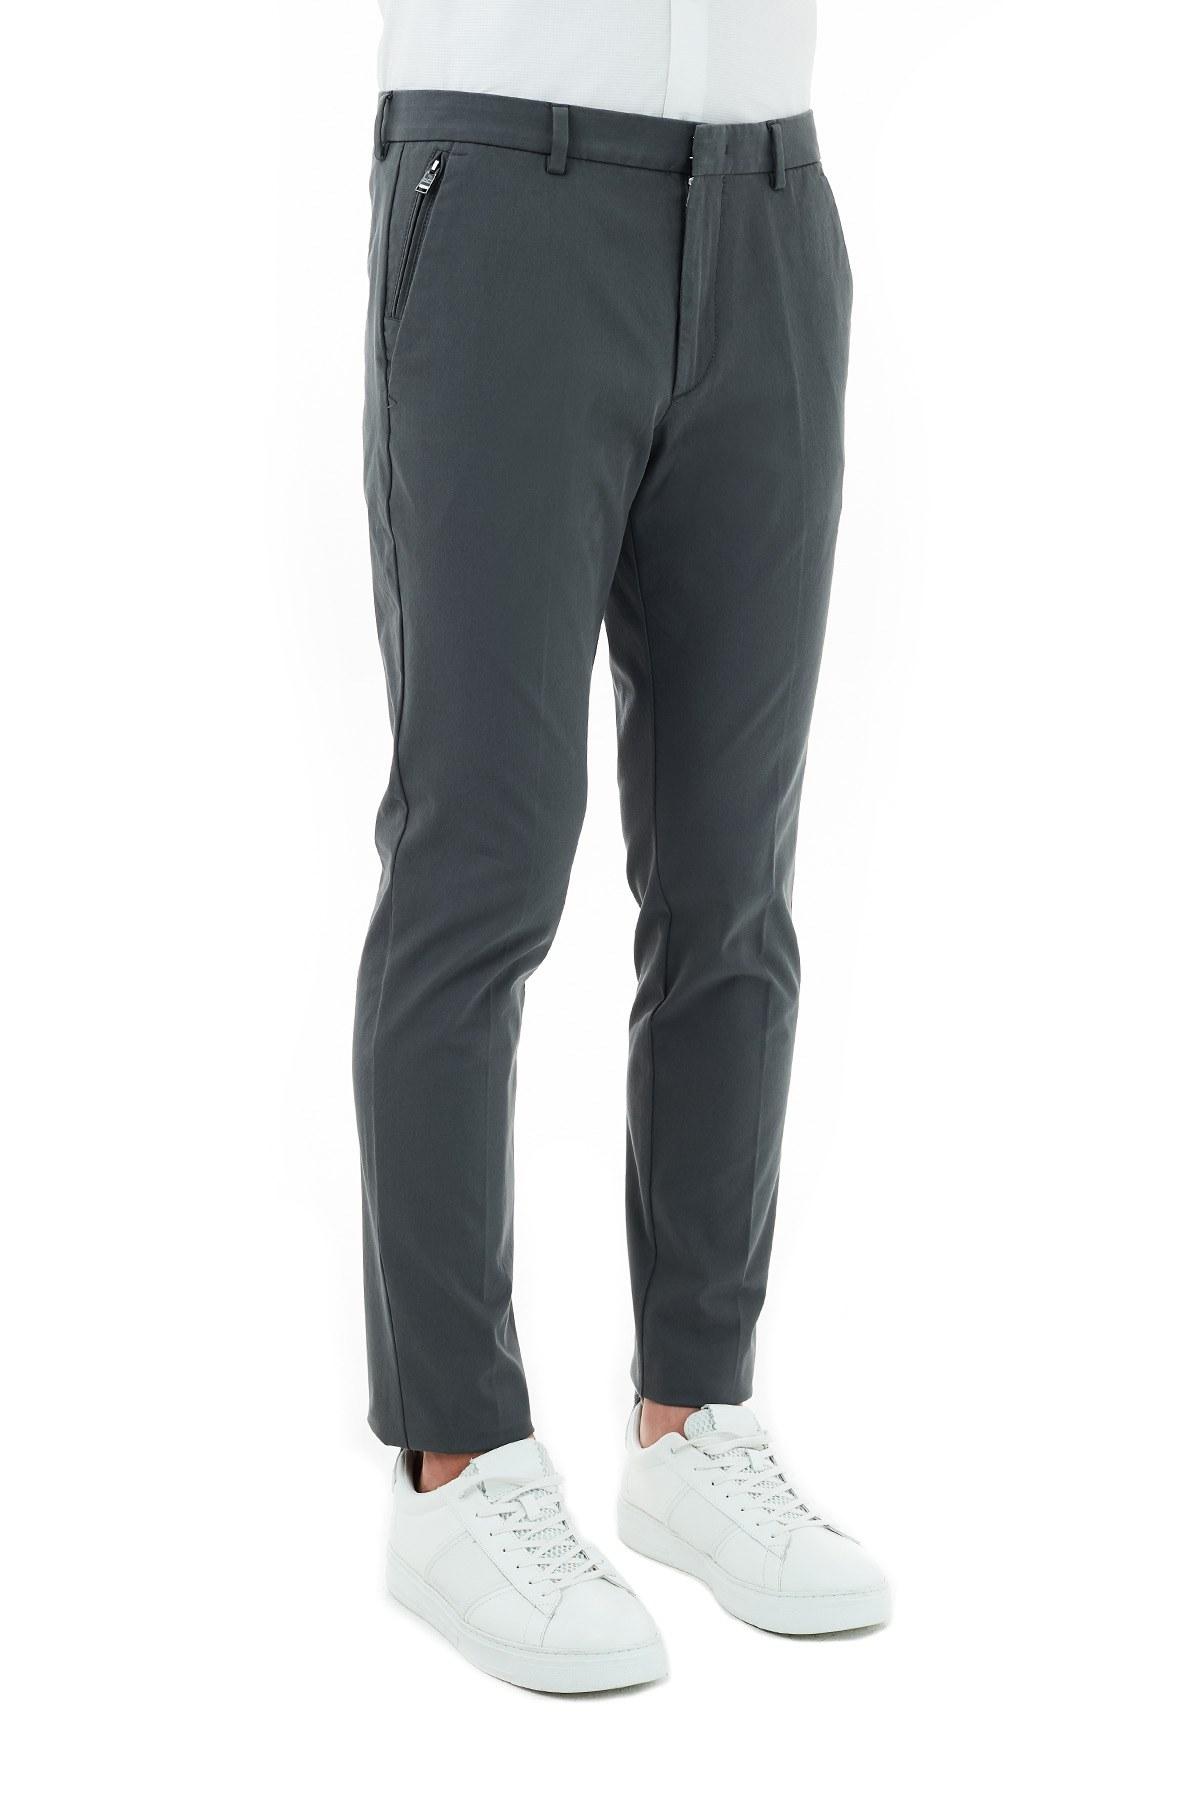 Hugo Boss Slim Fit Cepli Erkek Pantolon 50437895 032 GRİ